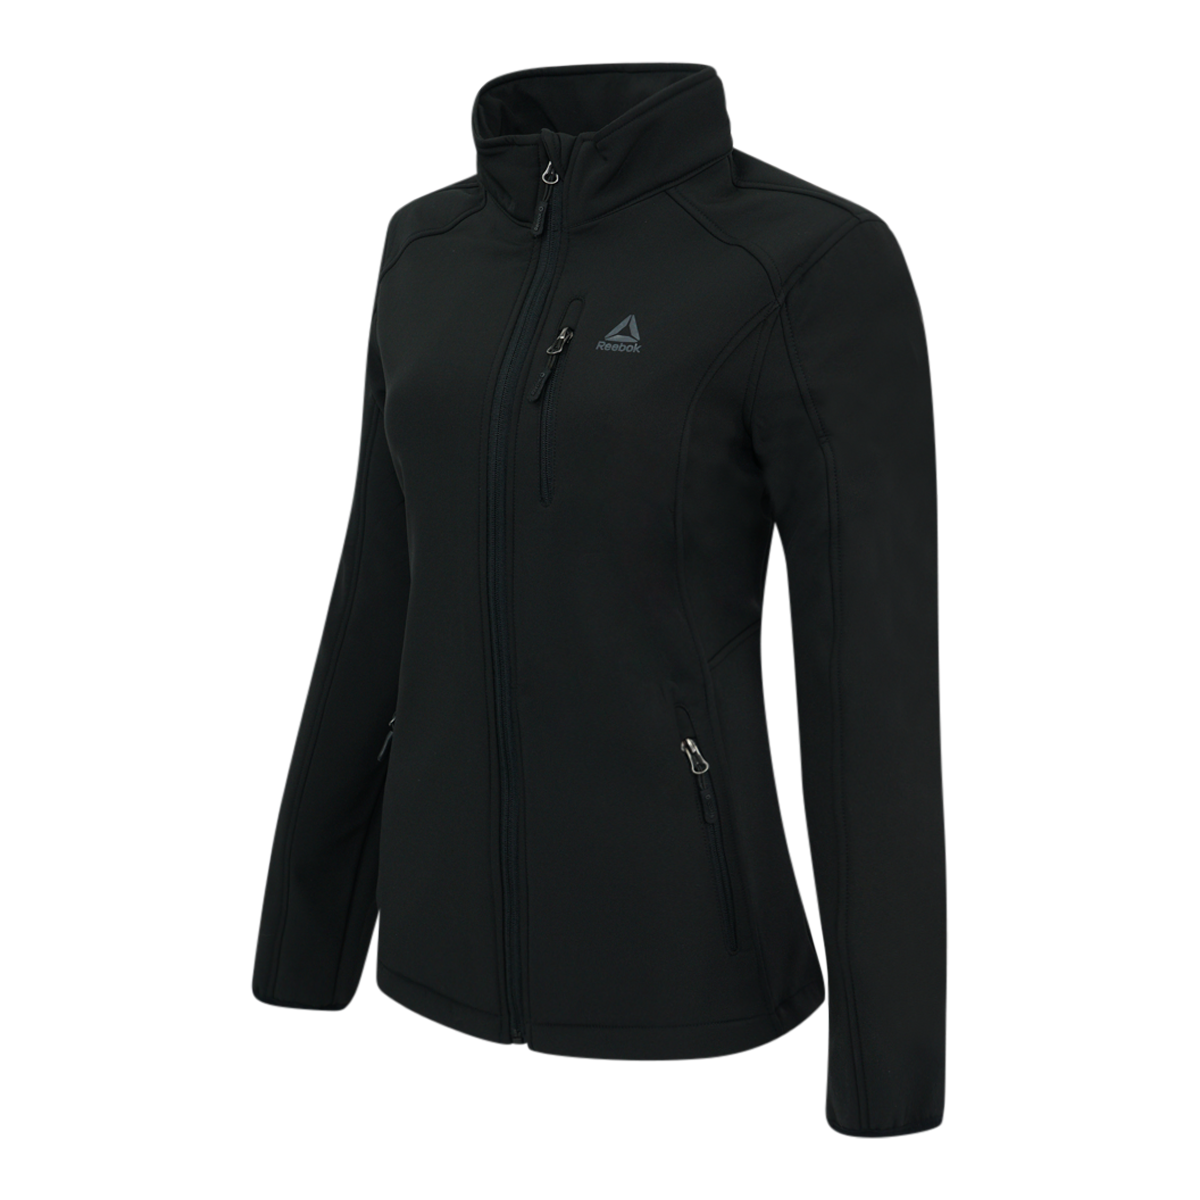 Reebok-Women-039-s-Full-Zip-Softshell-Jacket thumbnail 7